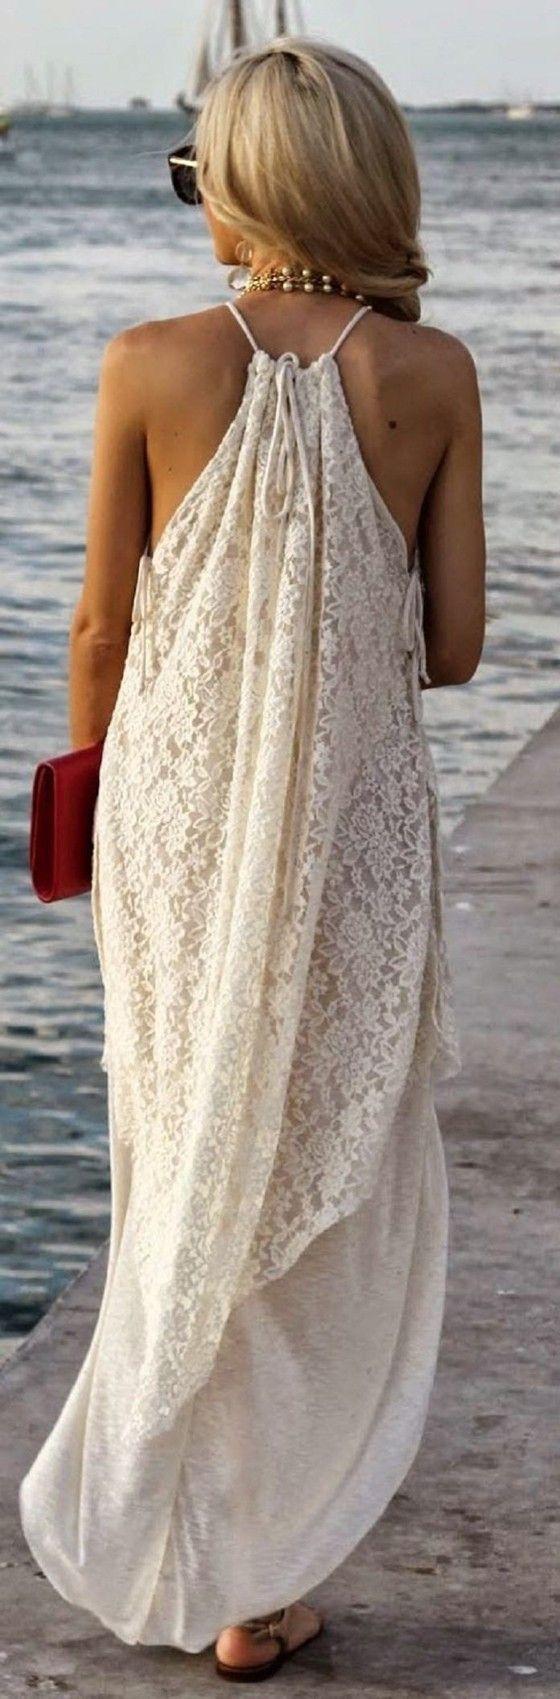 White Patchwork Condole Belt Cut Out Irregular Lace Off Shoulder Maxi Dress